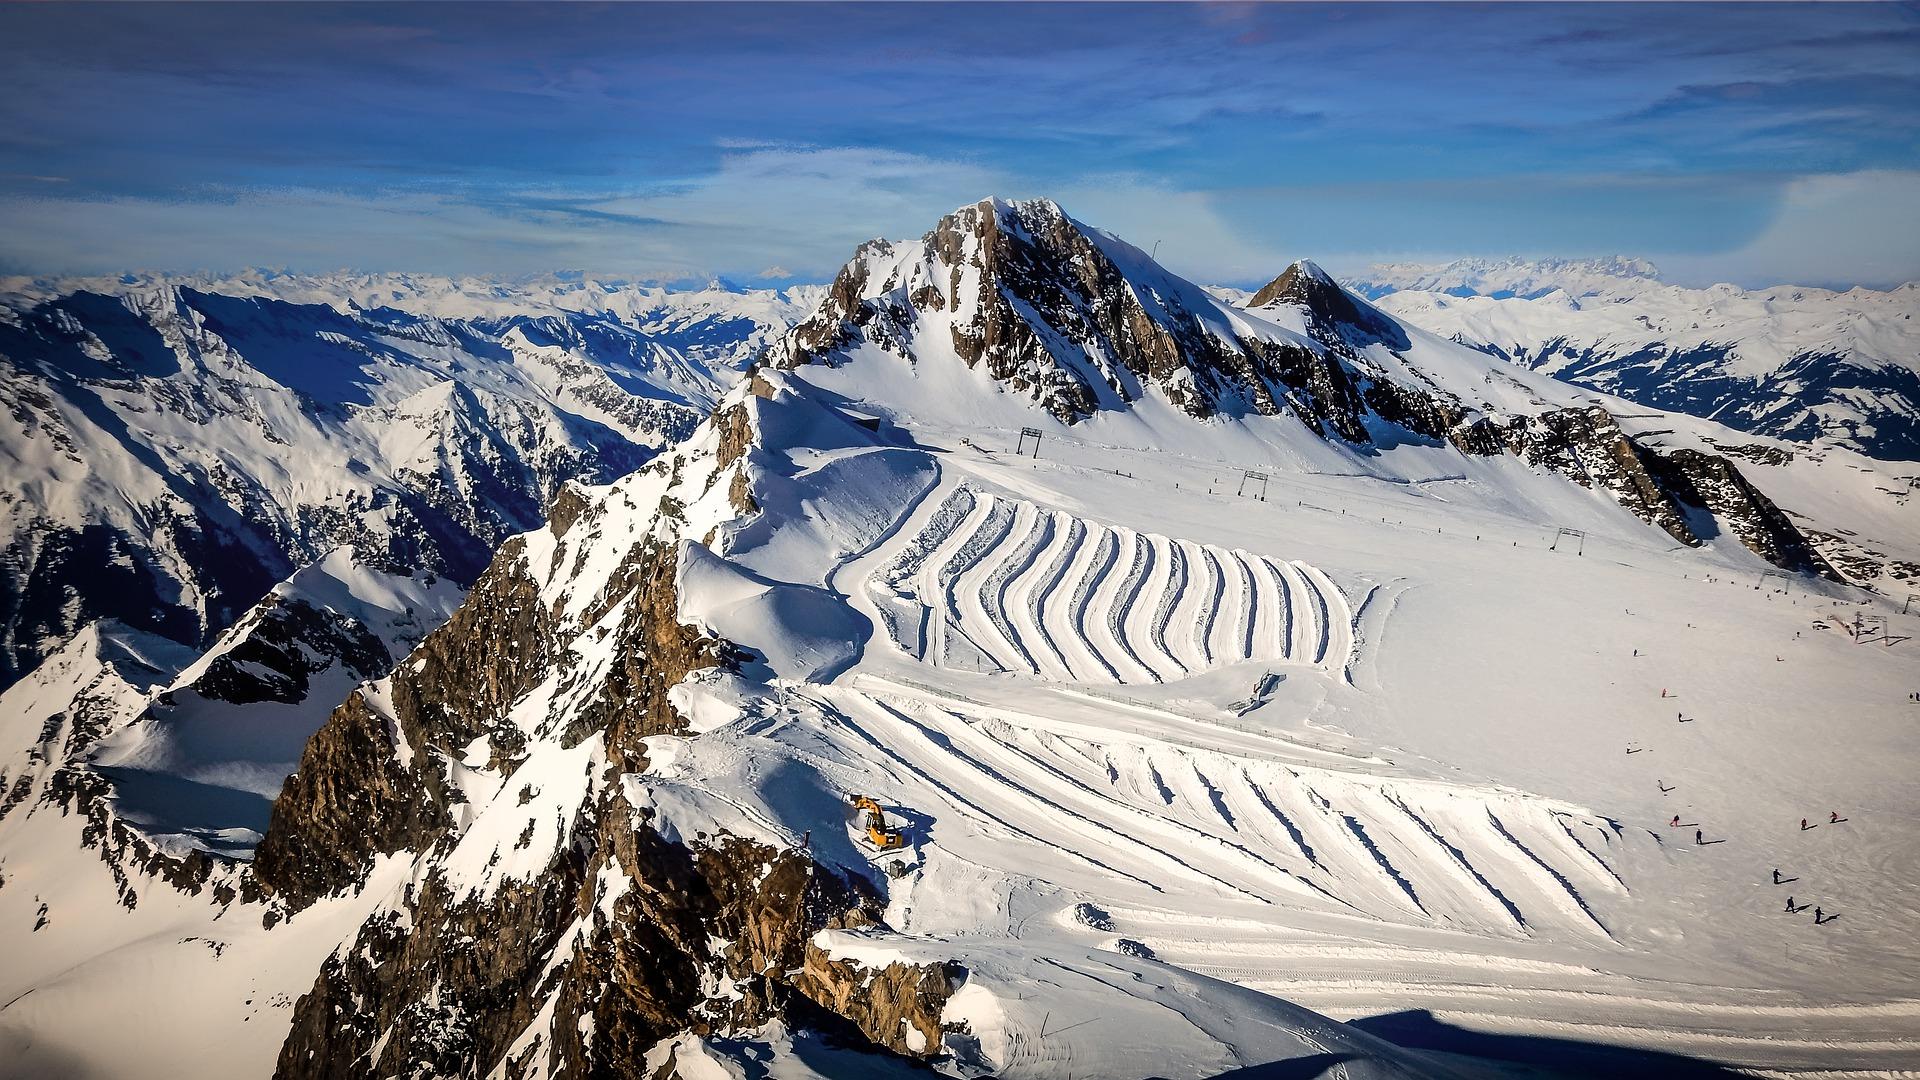 De sneeuwzekere Kirzsteinhorn gletjser